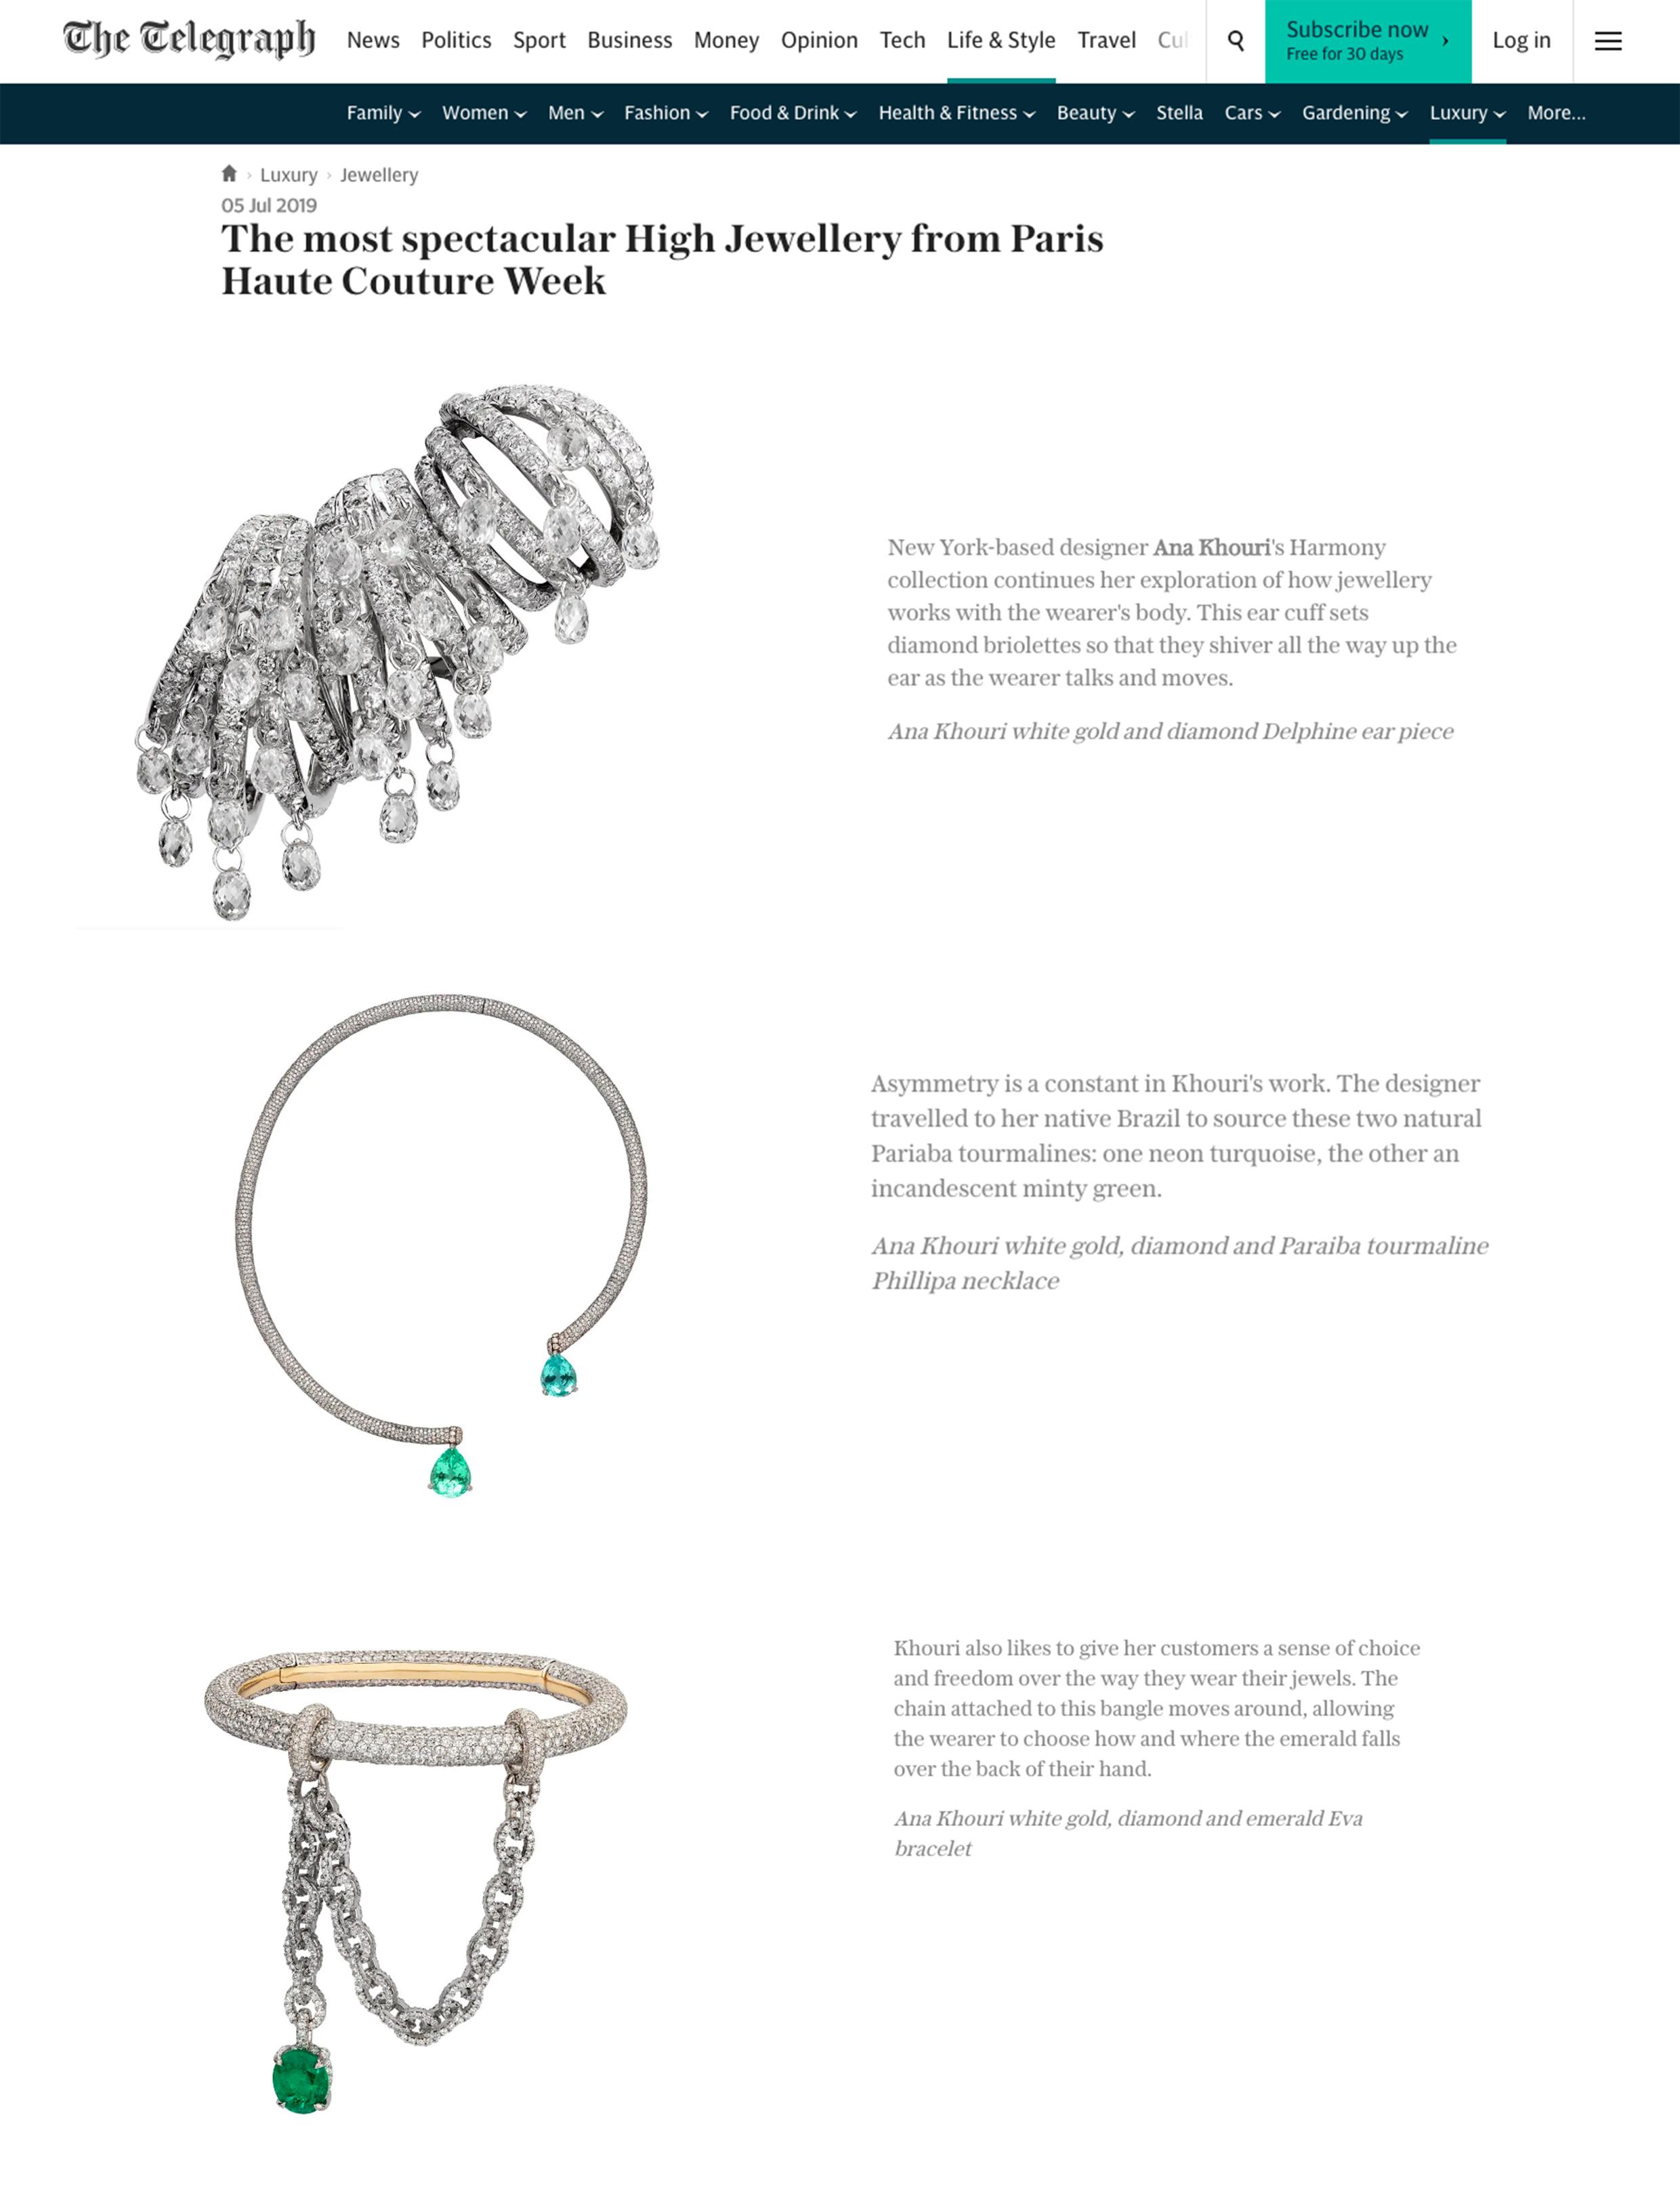 Telegraph.co UK Online July 5, 2019 USA1795 Diamond and Tourmaline Paraiba Phillipa Necklace, USA1797 Diamond and Emerald Eva Bracelet, USA1811 Diamond Briolette Delphine Ear Cuff.jpg